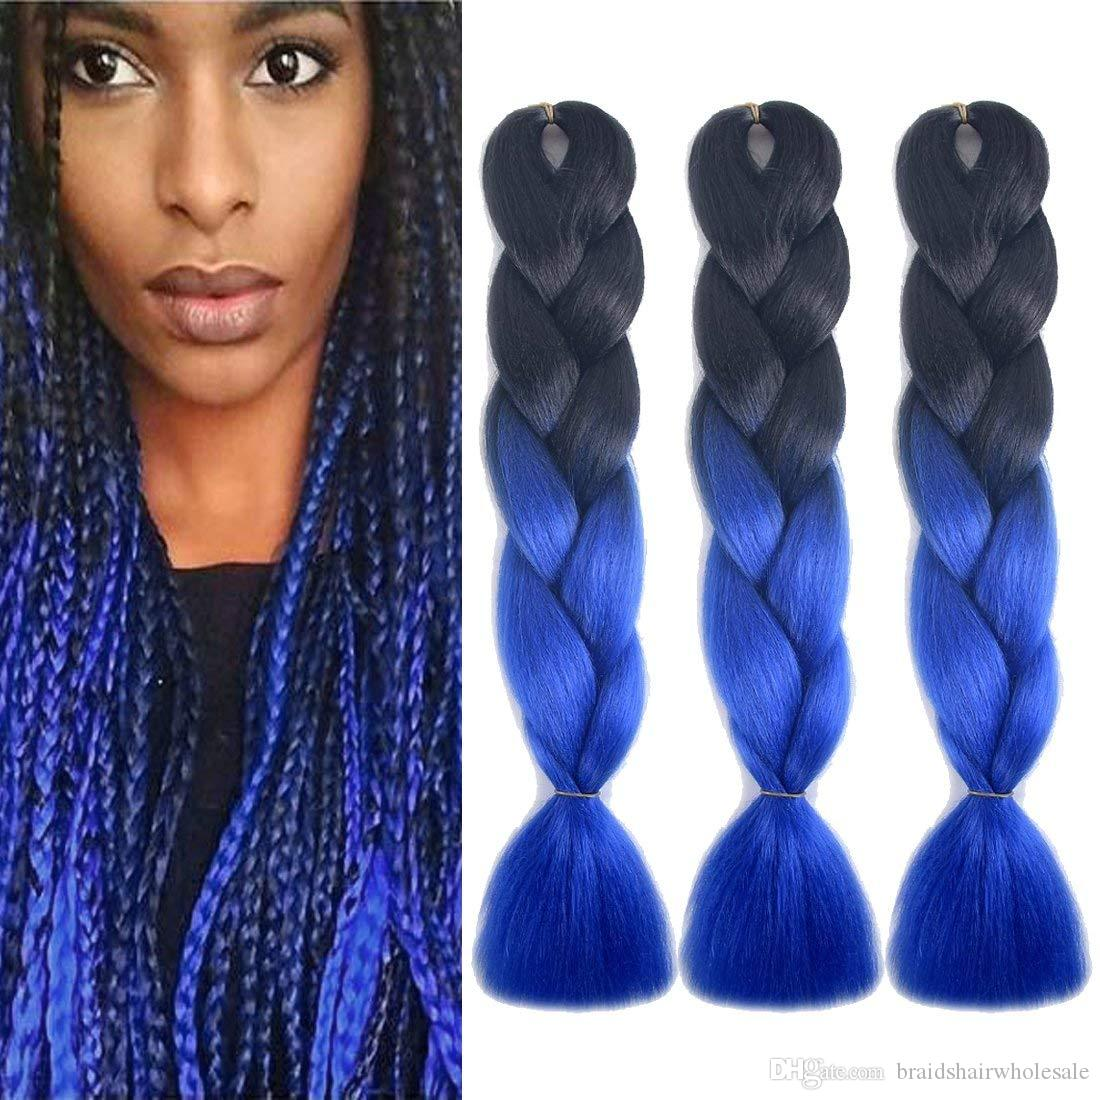 Xpression Ombre Braiding hair Kanekalon Synthetic